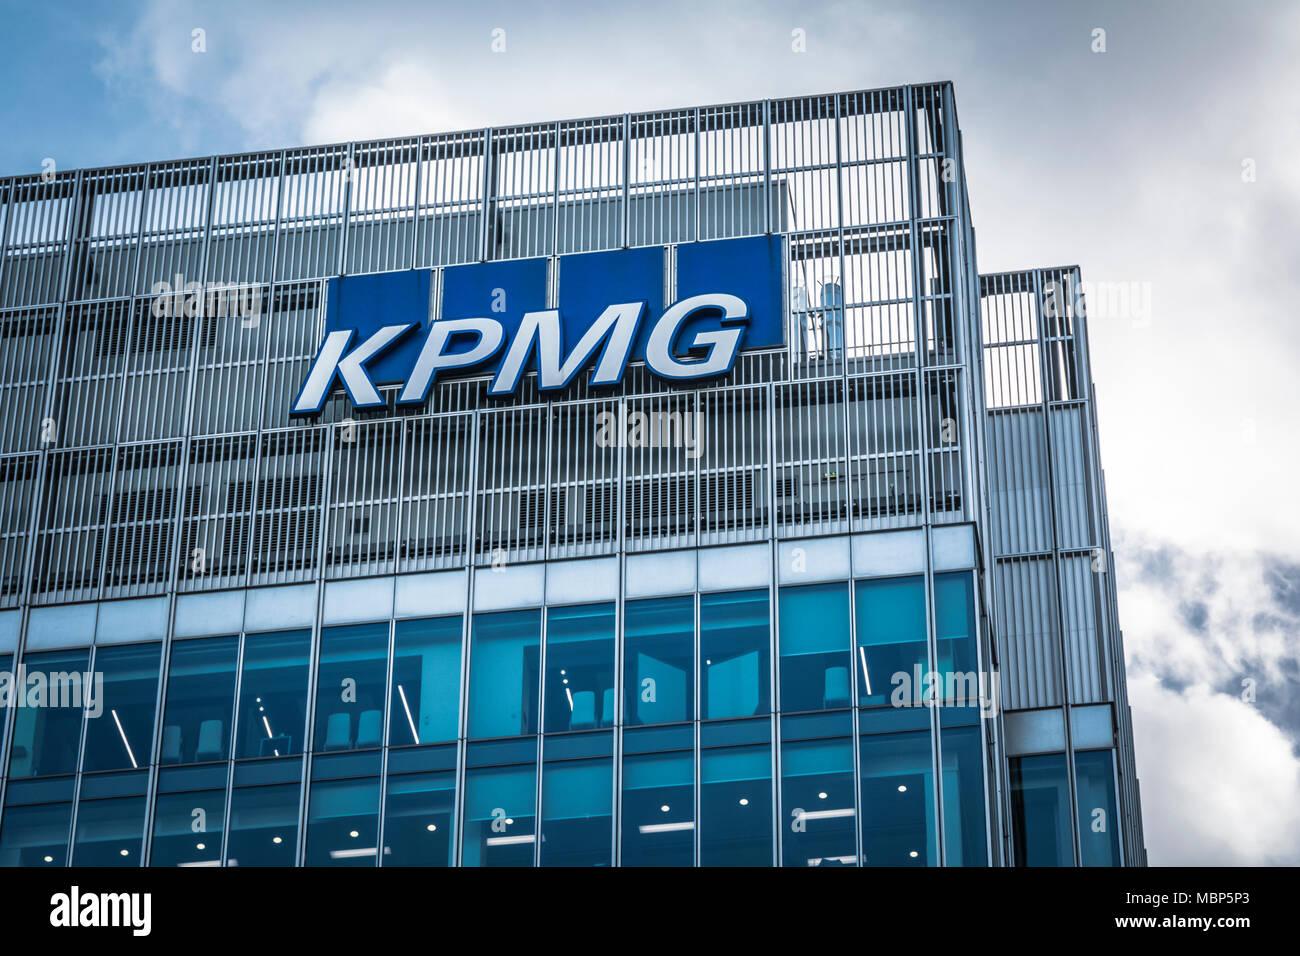 KPMG building, London, UK Stock Photo